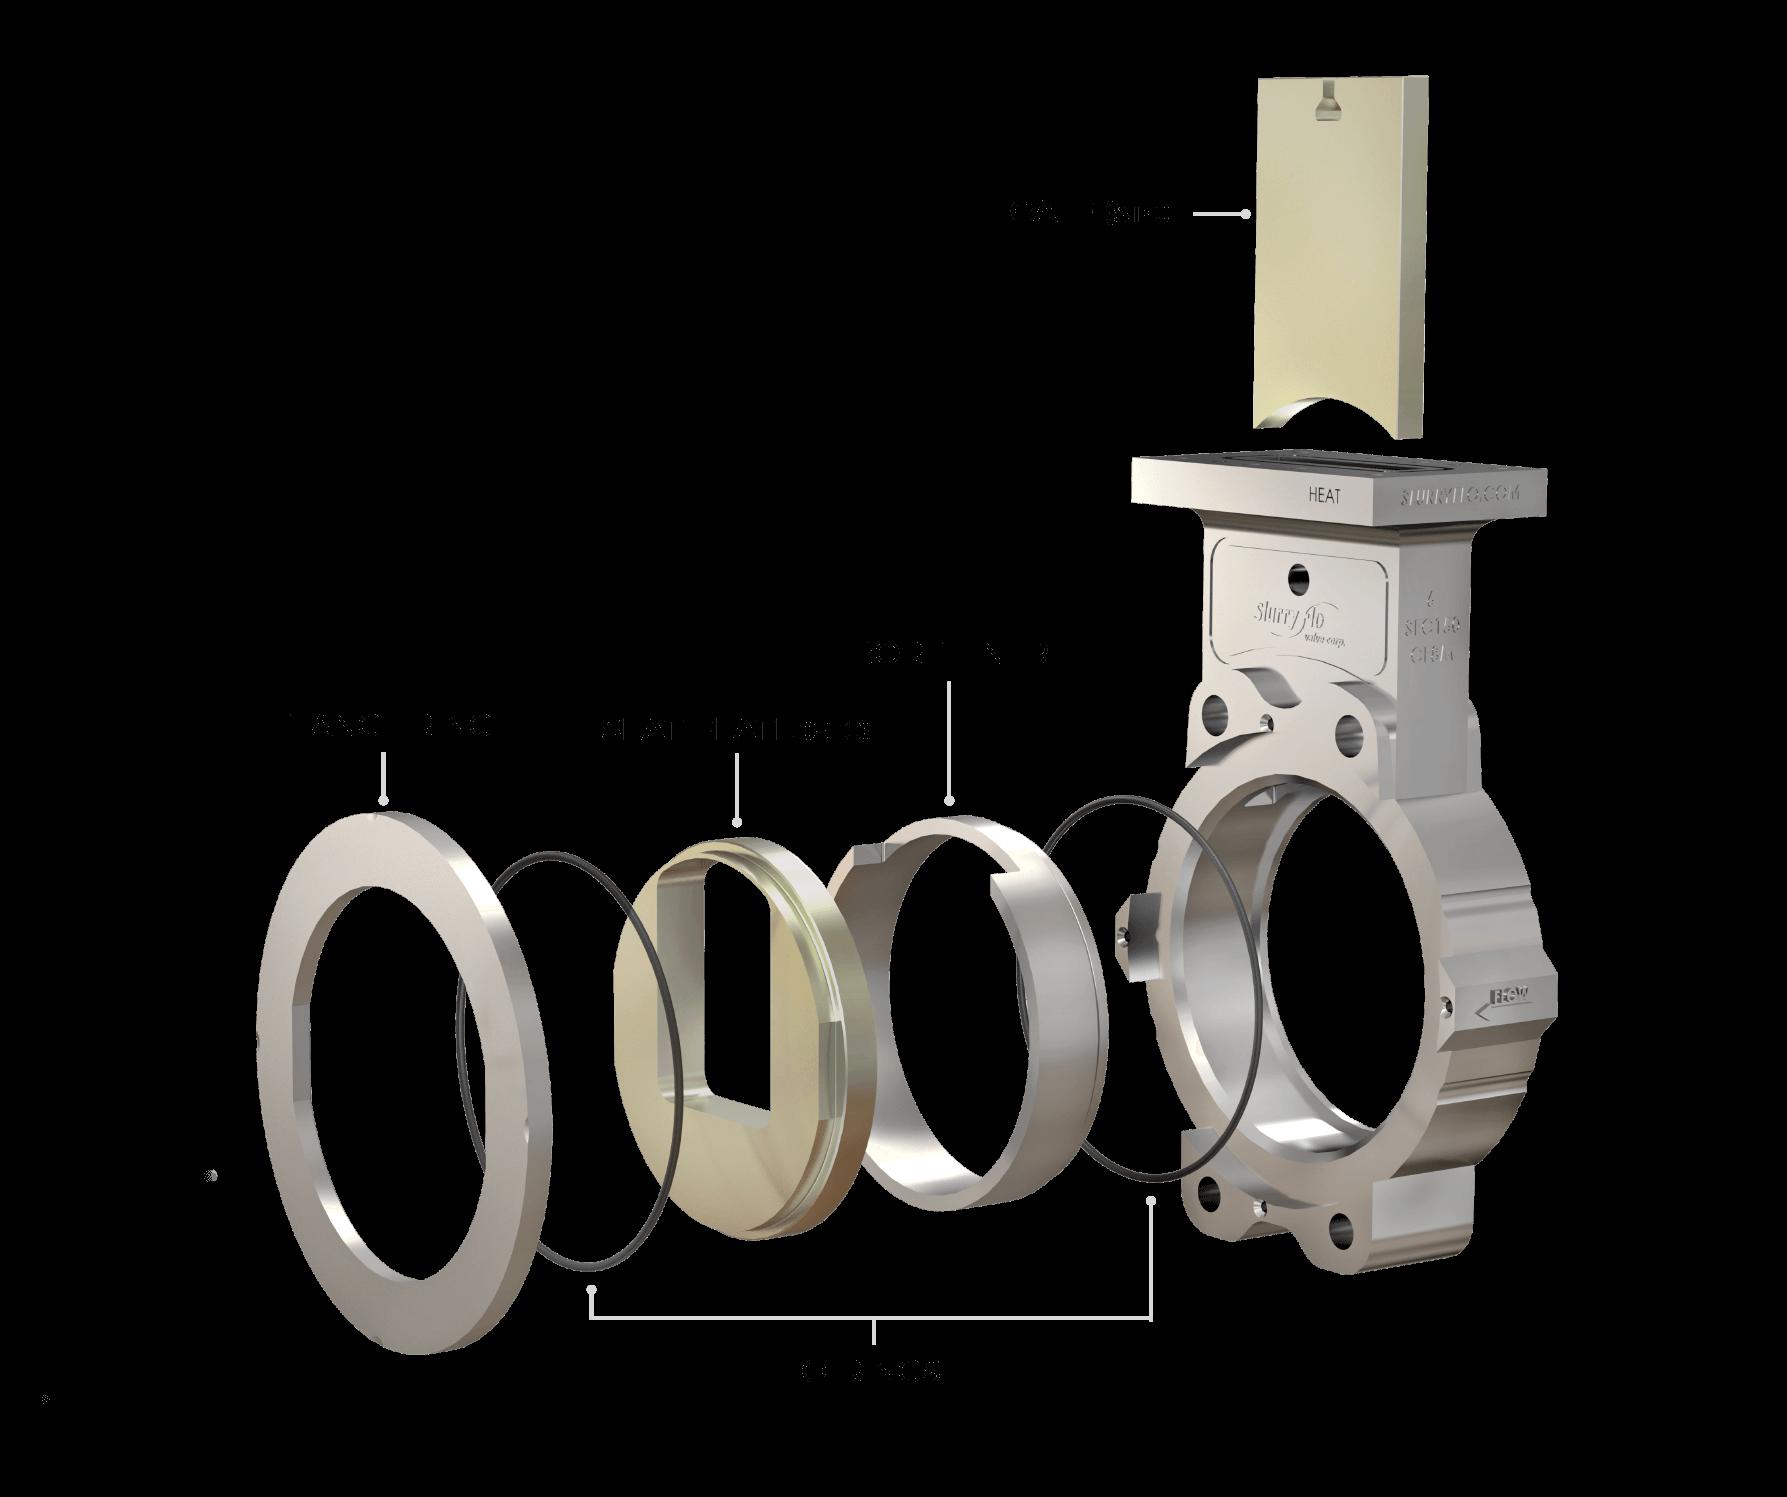 SlurryFlo control cast valve - labelled parts and materials.